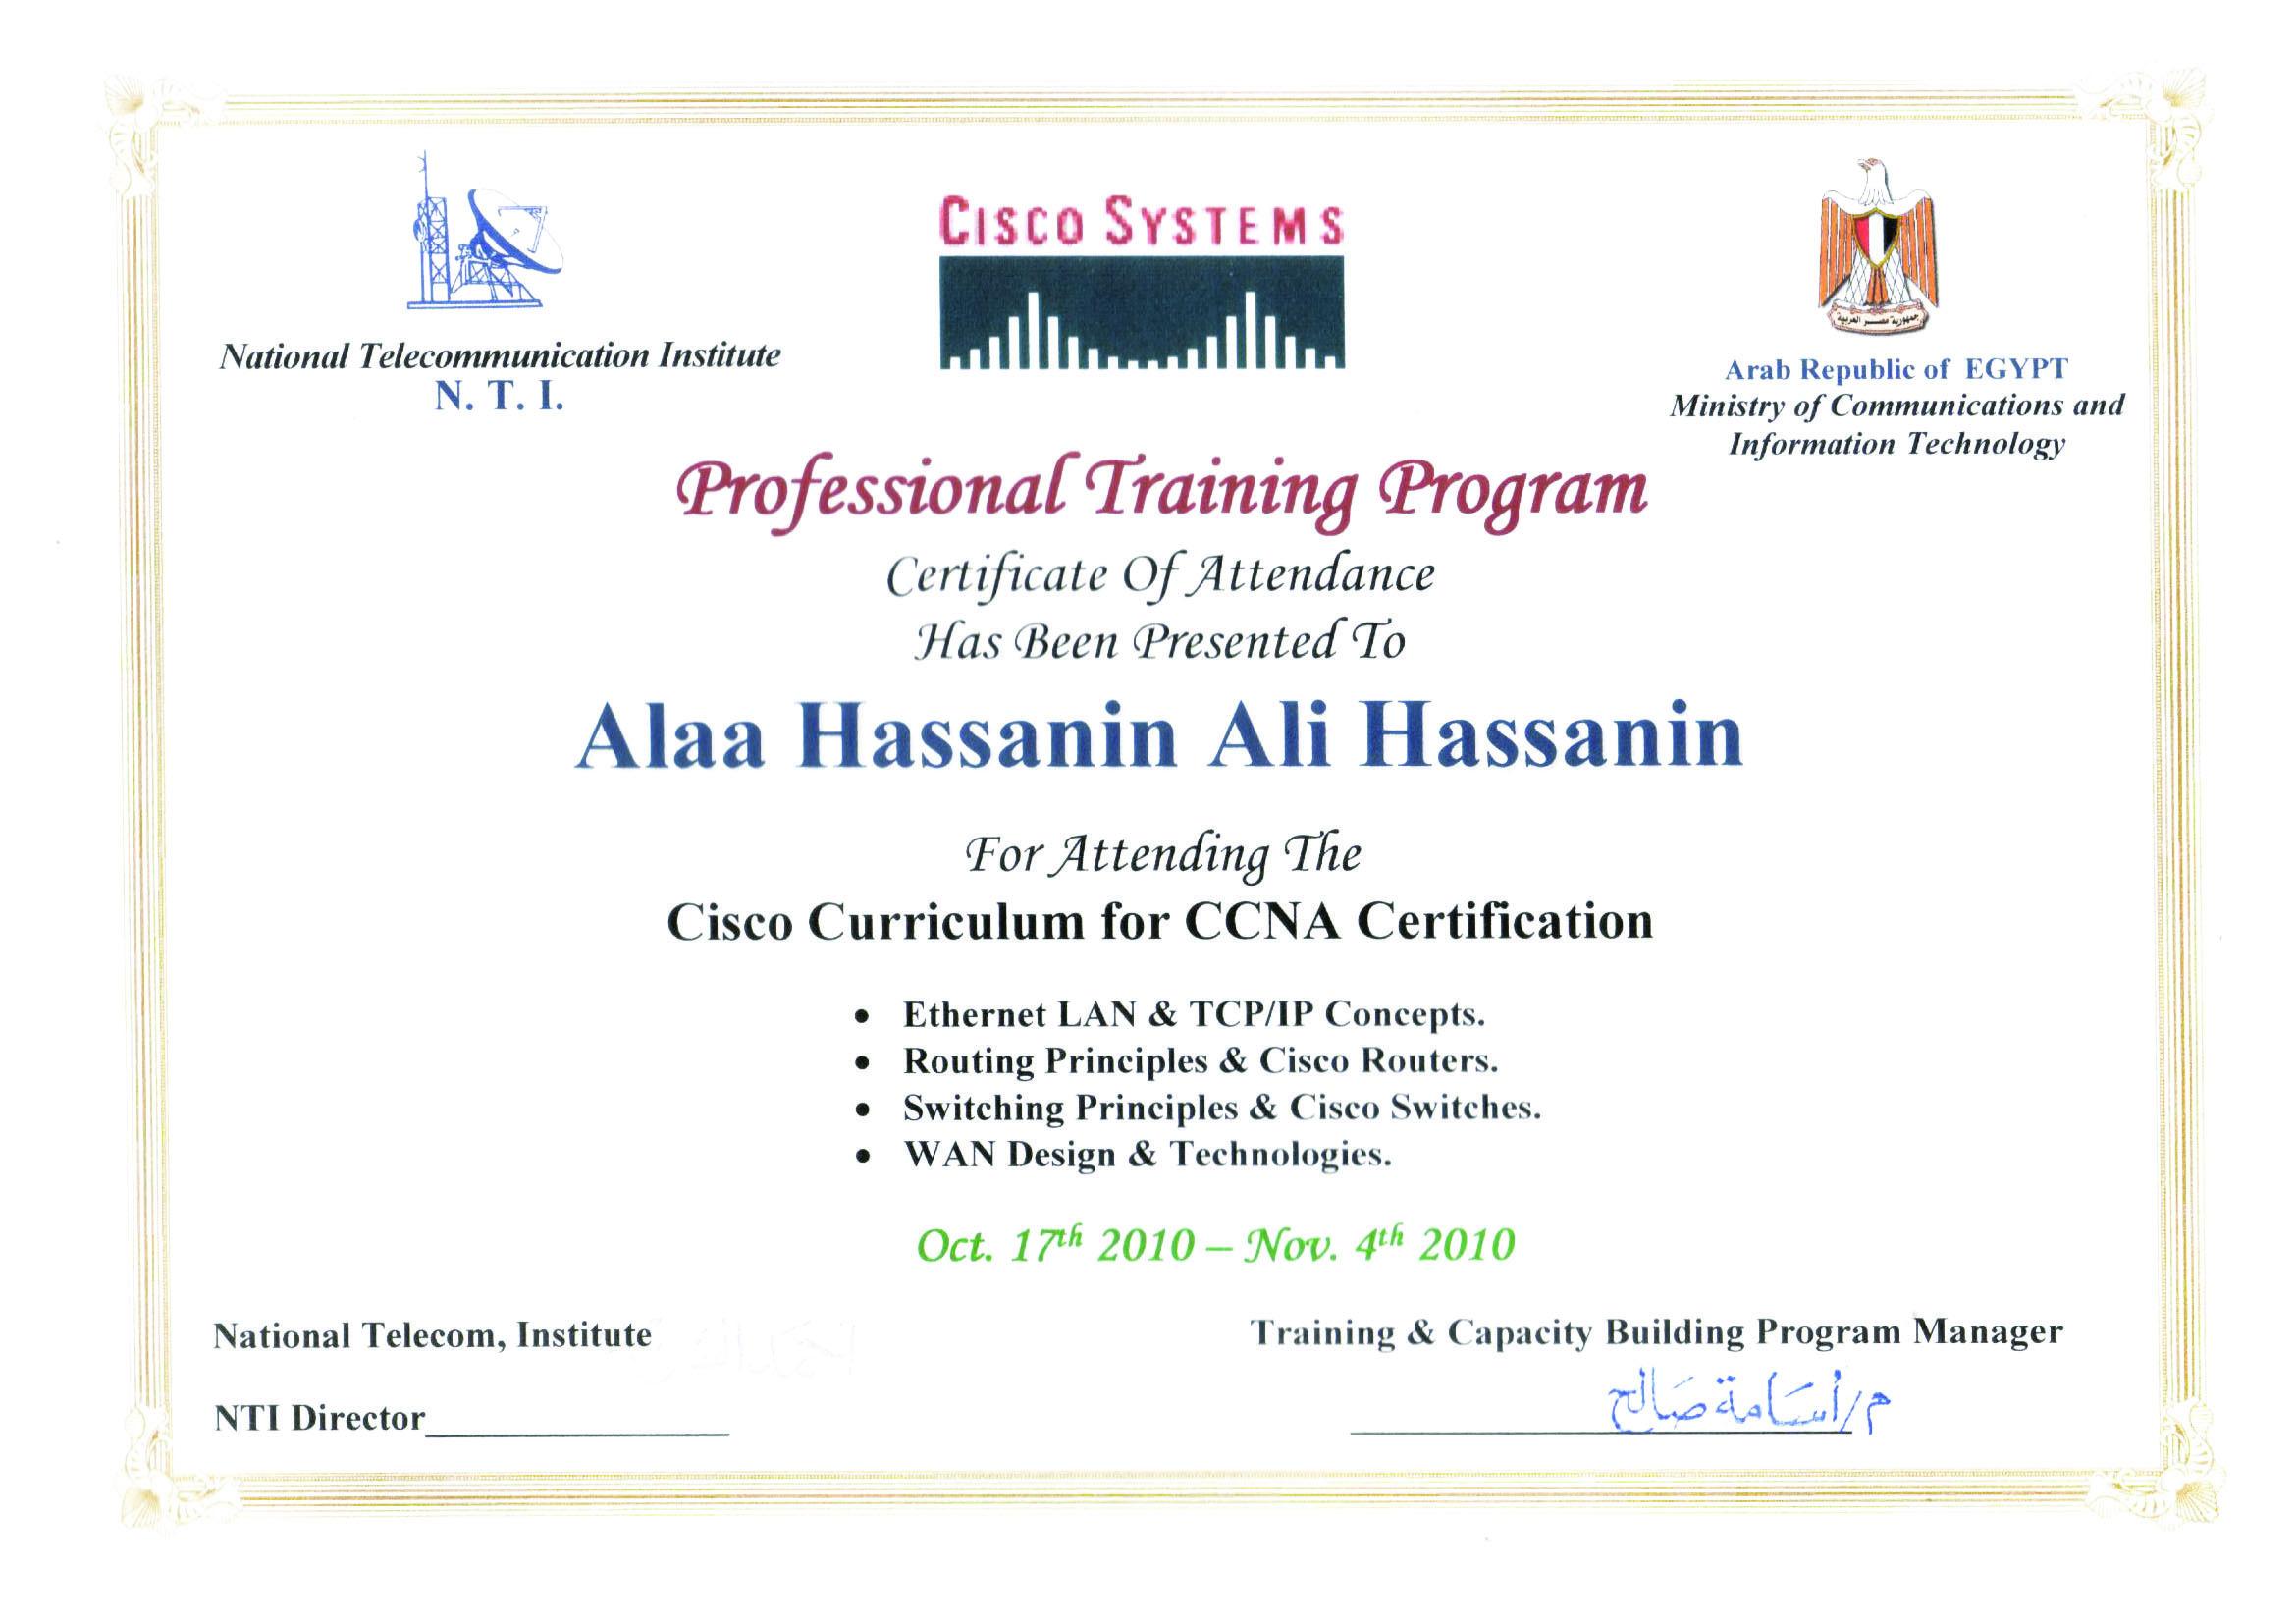 Alaa hassanein bayt training institute national telecommunication institute egypt xflitez Gallery